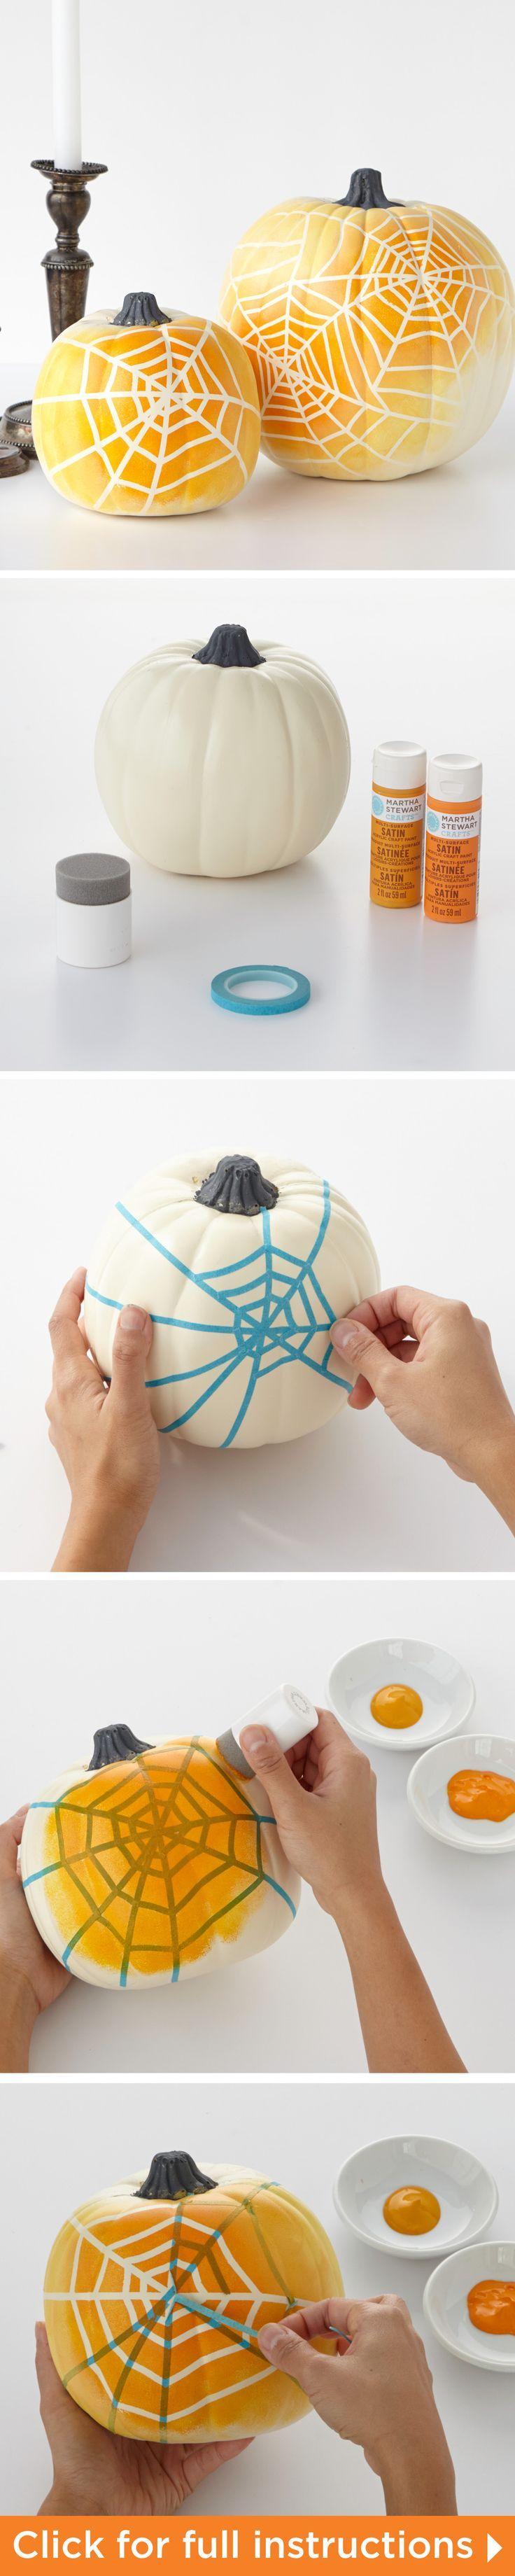 64 Creative No-Carve Pumpkin Ideas to Make This Halloween ...